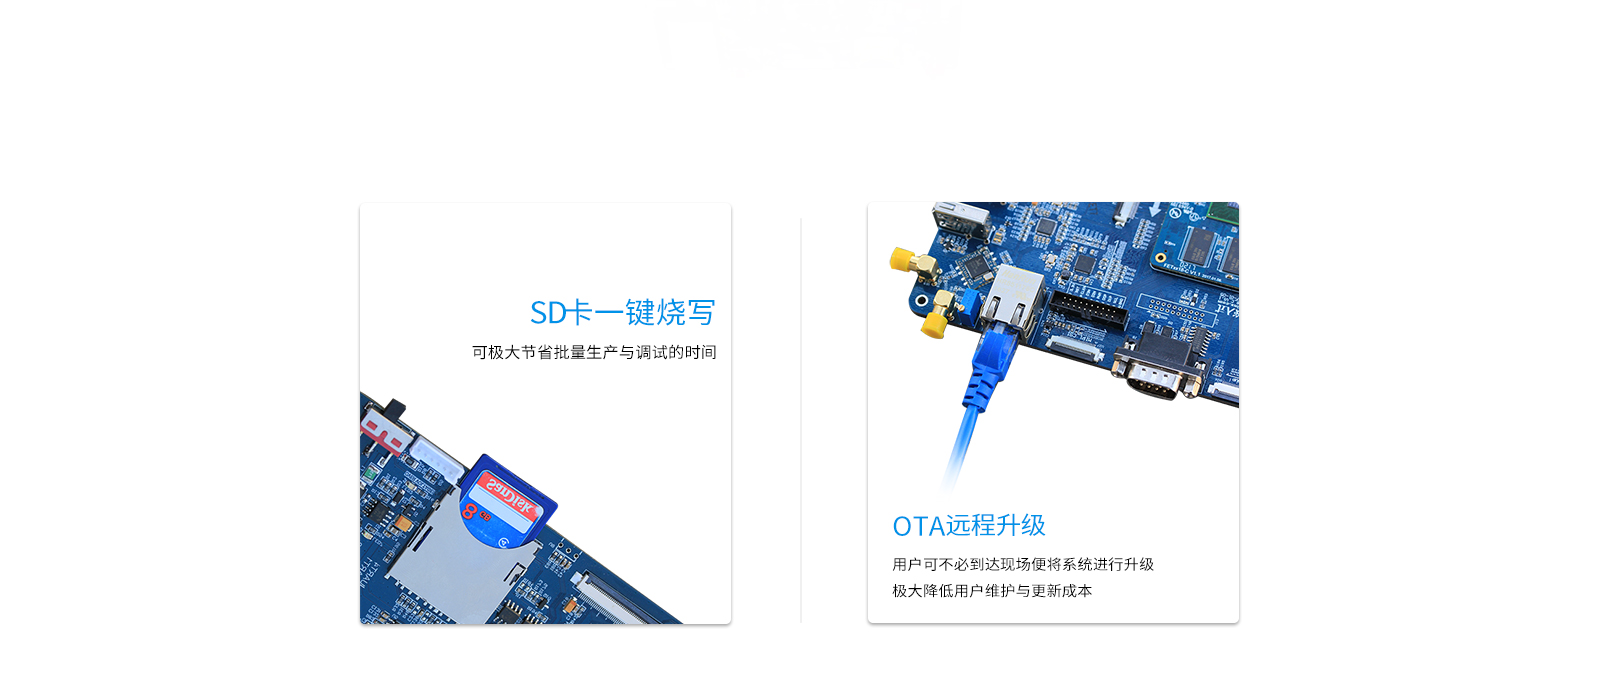 S5P4418shao写yu远cheng升级